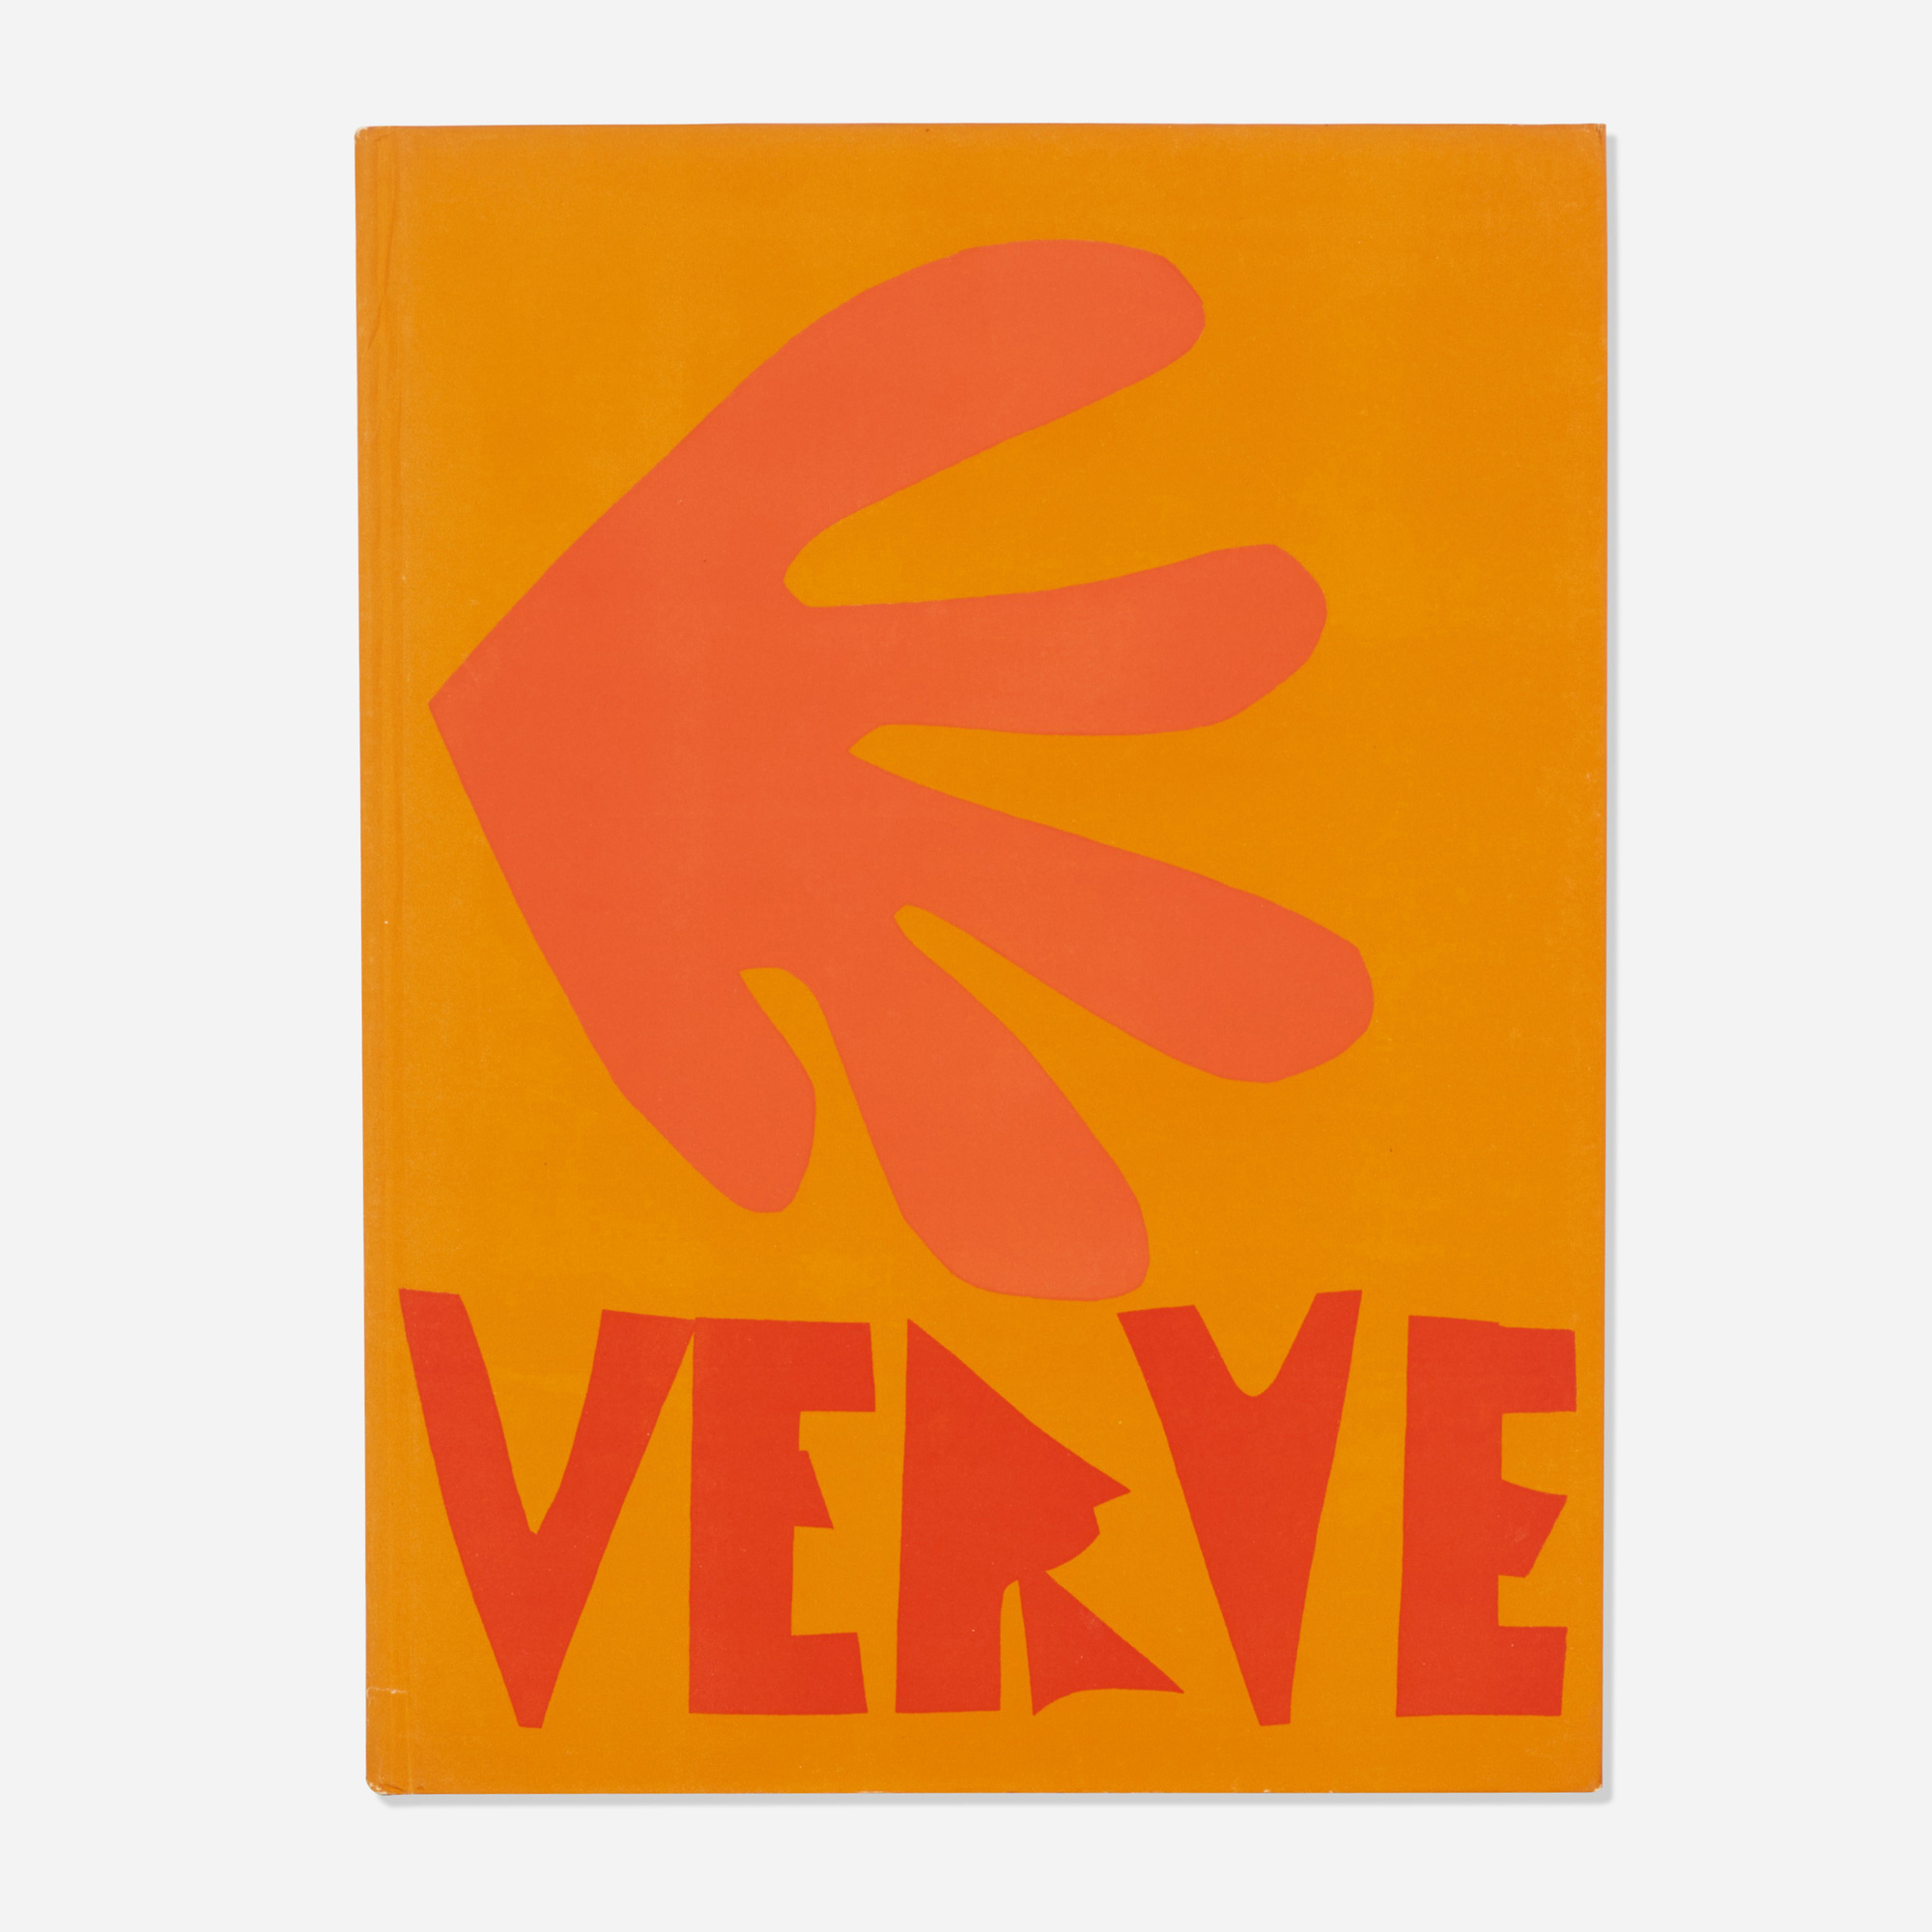 157: Various Artists / Portfolio Revue Verve (3 of 5)